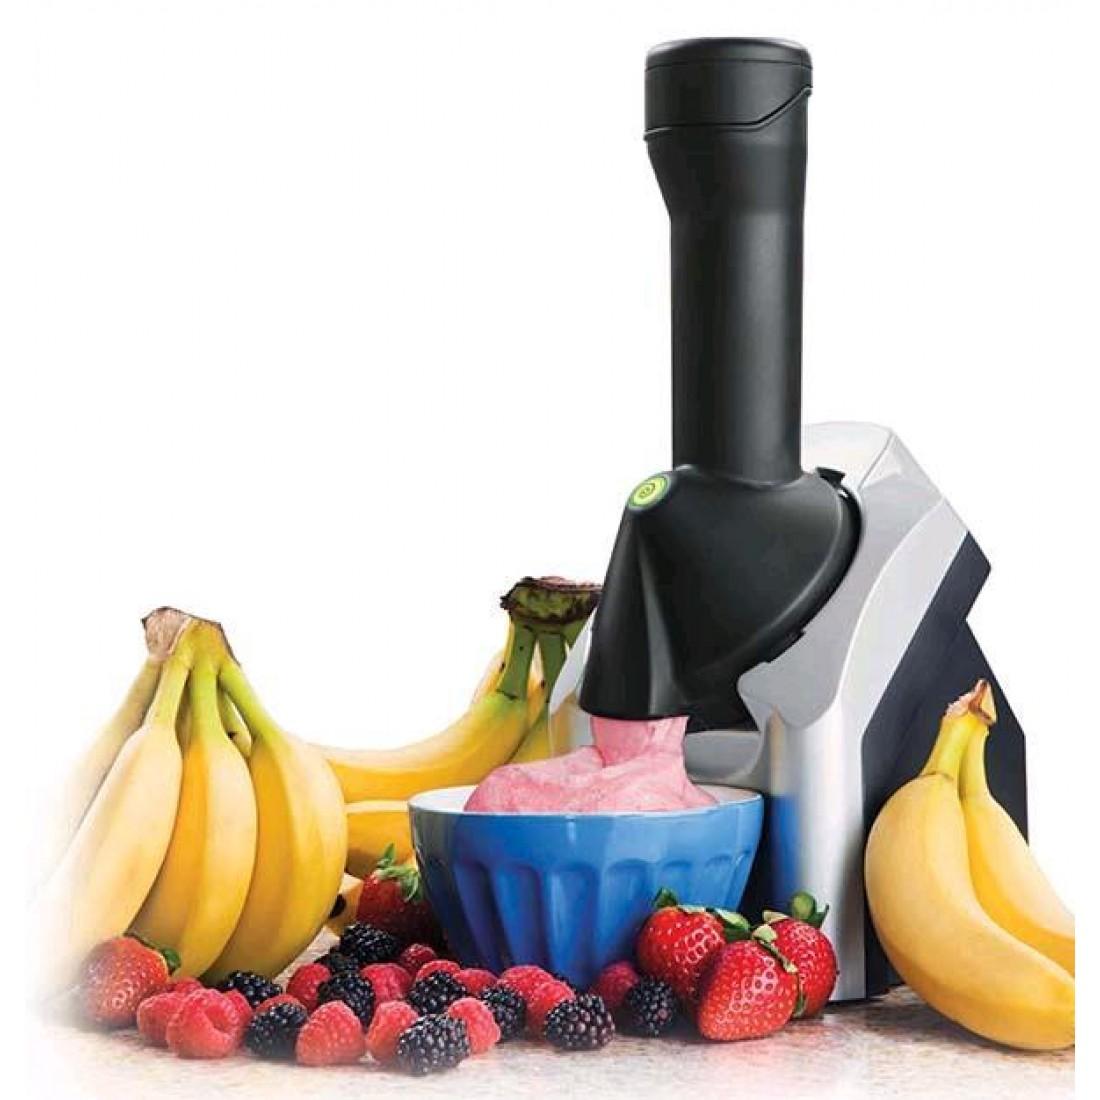 yonauas-frozen-fruits-ice-cream-yoghurt-dessert-maker-pgcgallery-1602-25-pgcgallery_54_1_